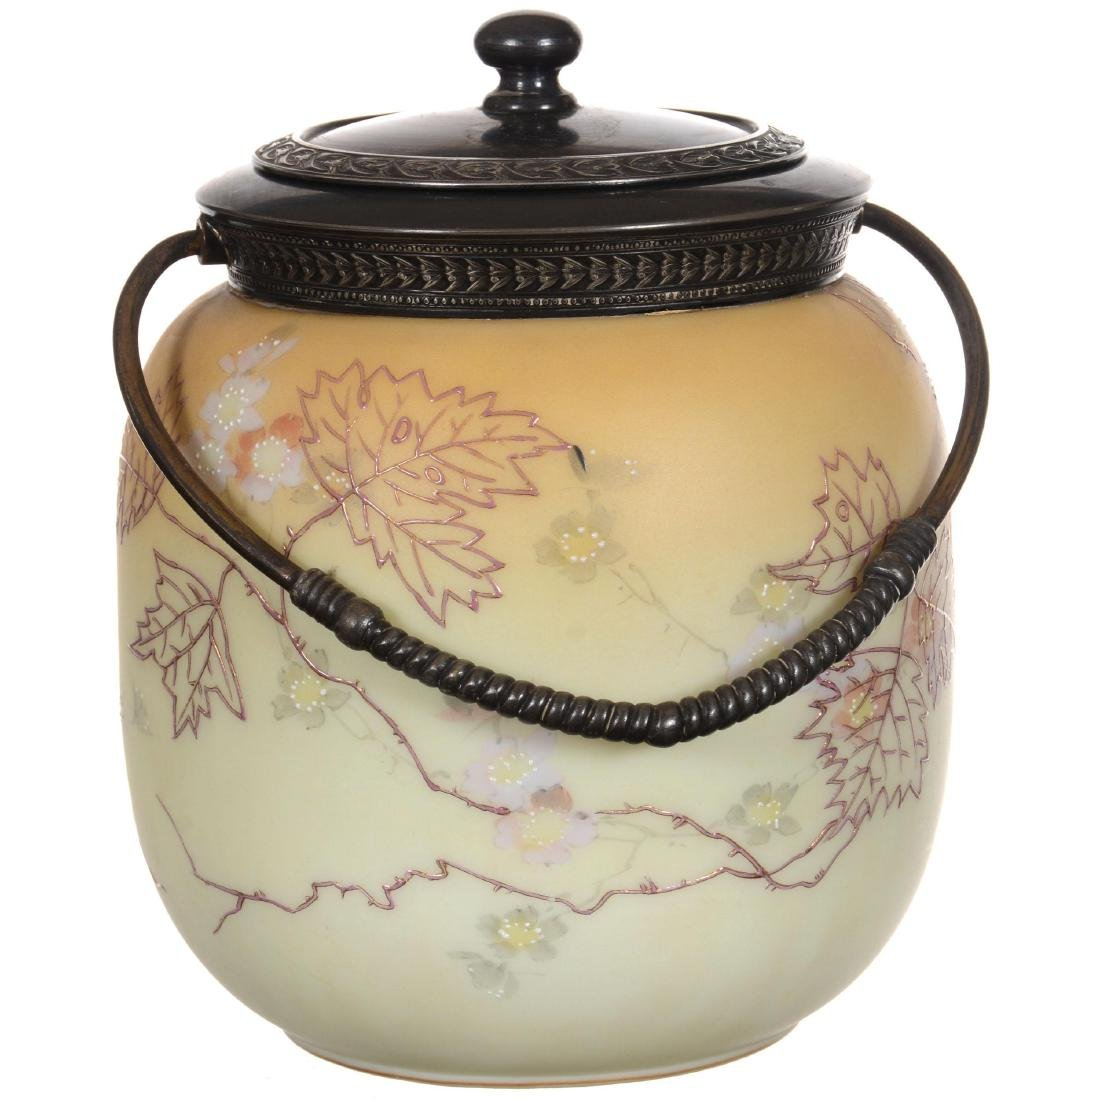 Marked Crown Milano Art Glass Biscuit Jar - 2